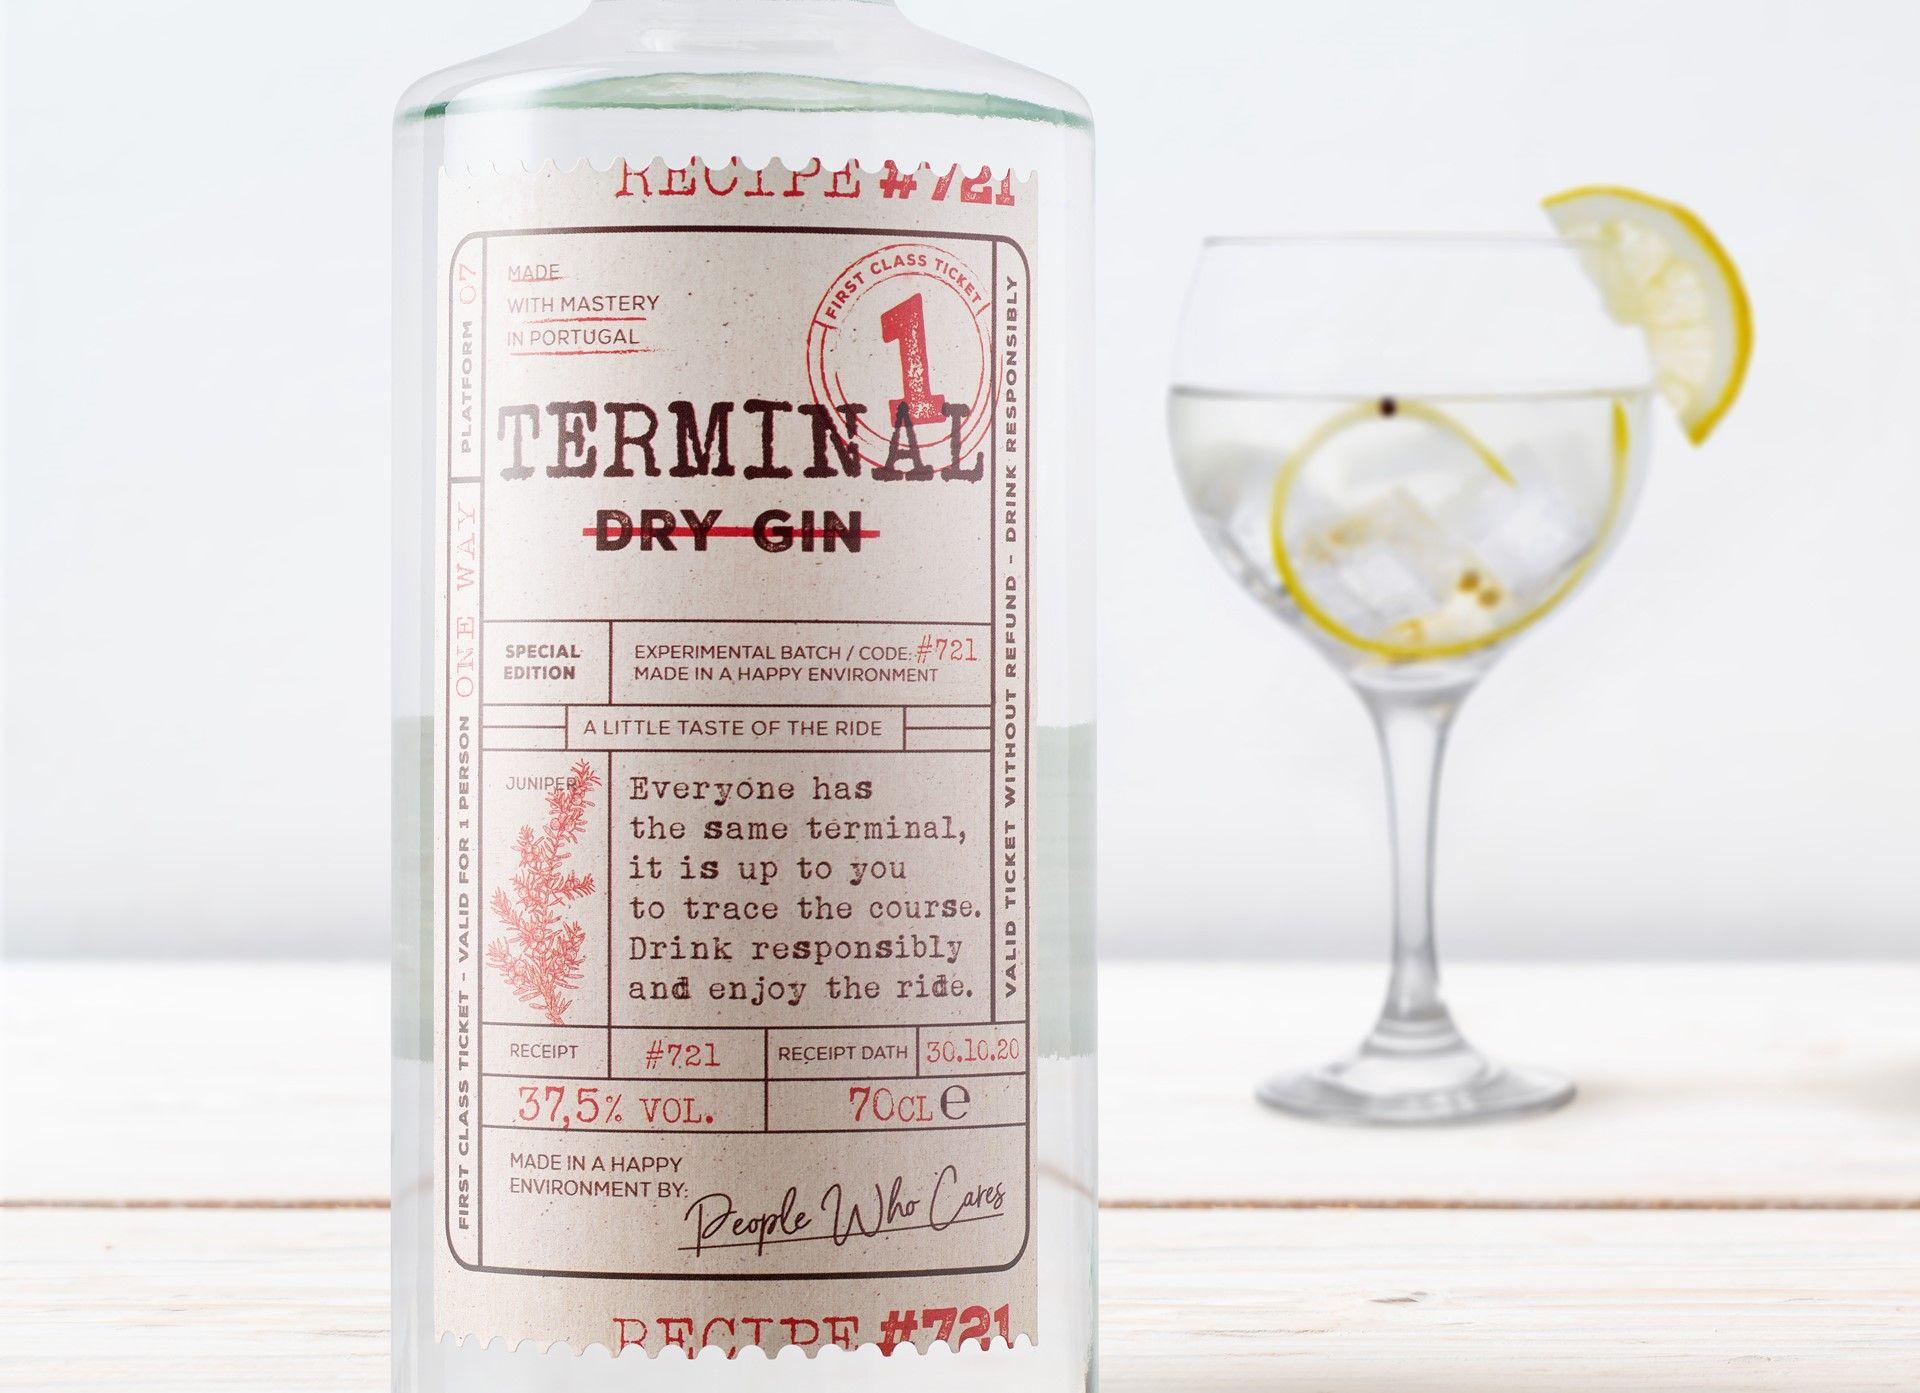 Terminal Dry Gin